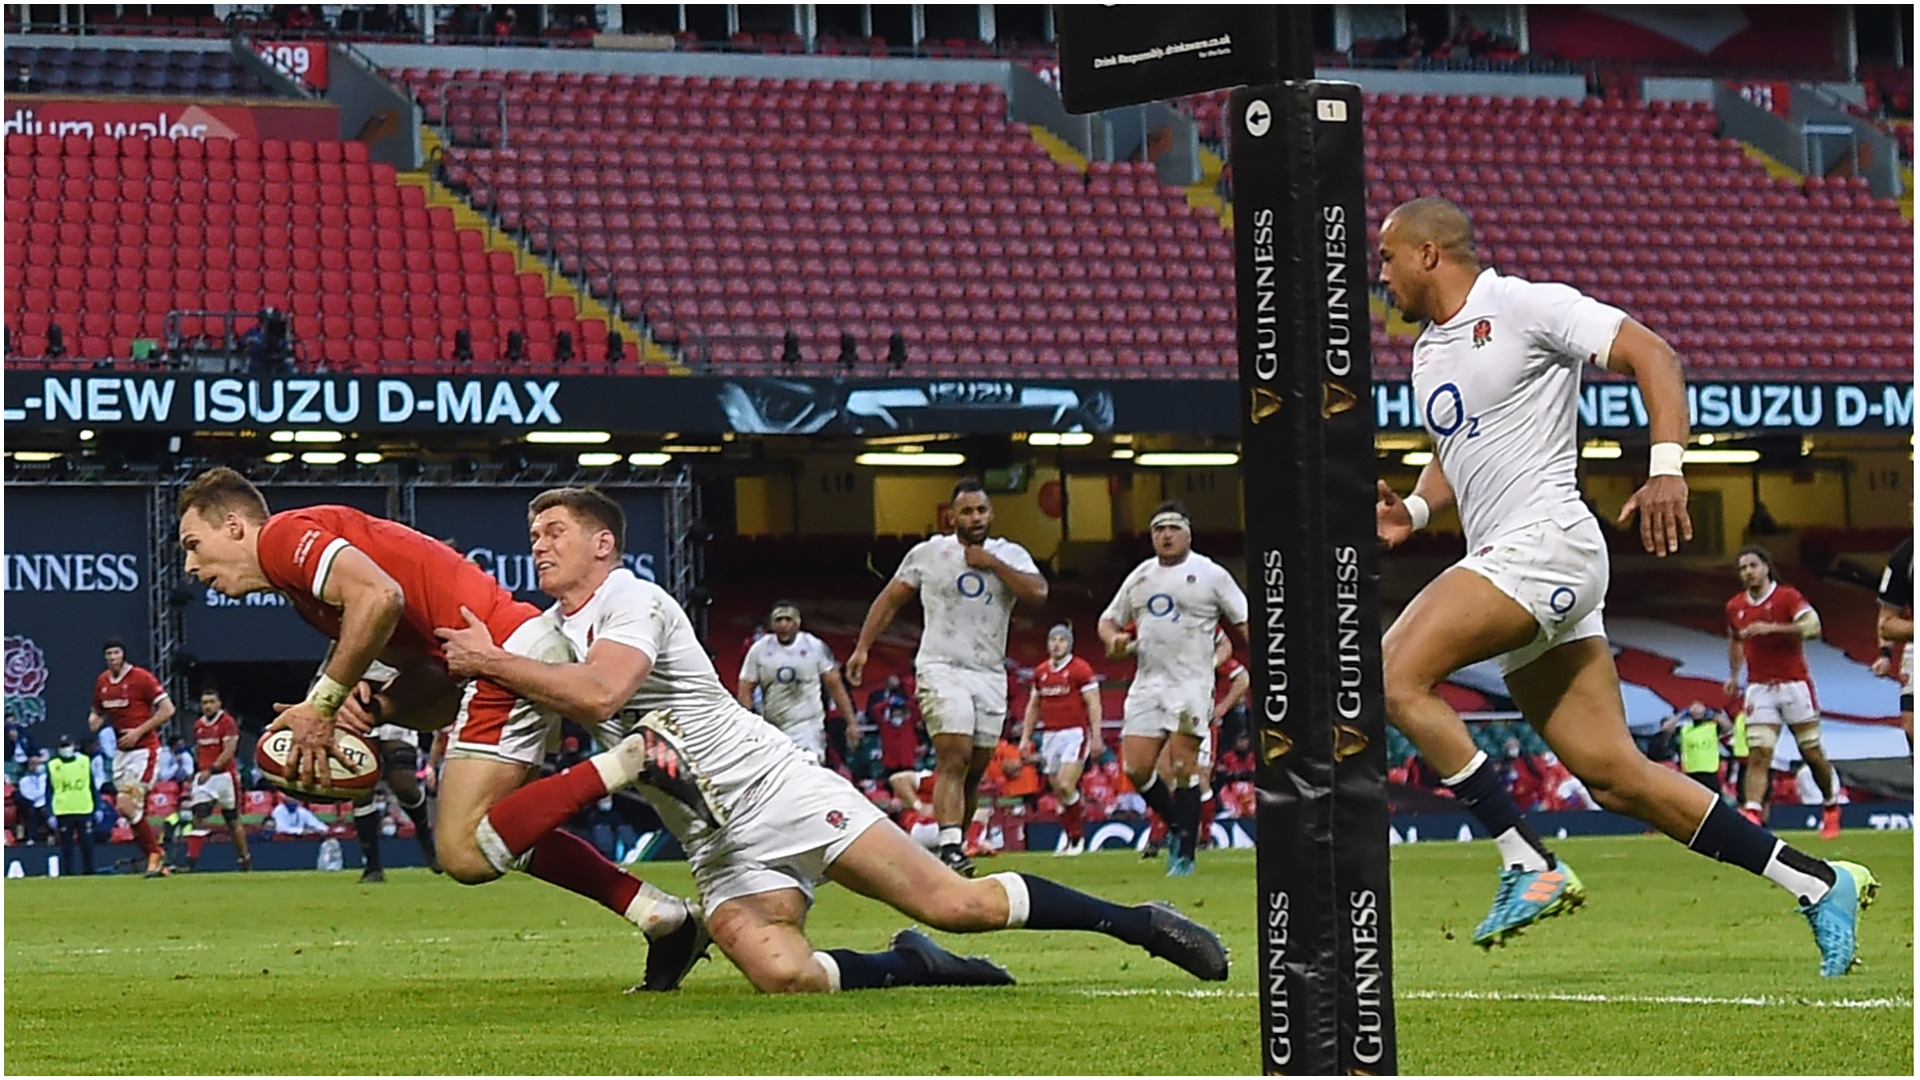 Six Nations 2021: Wales 40-24 England